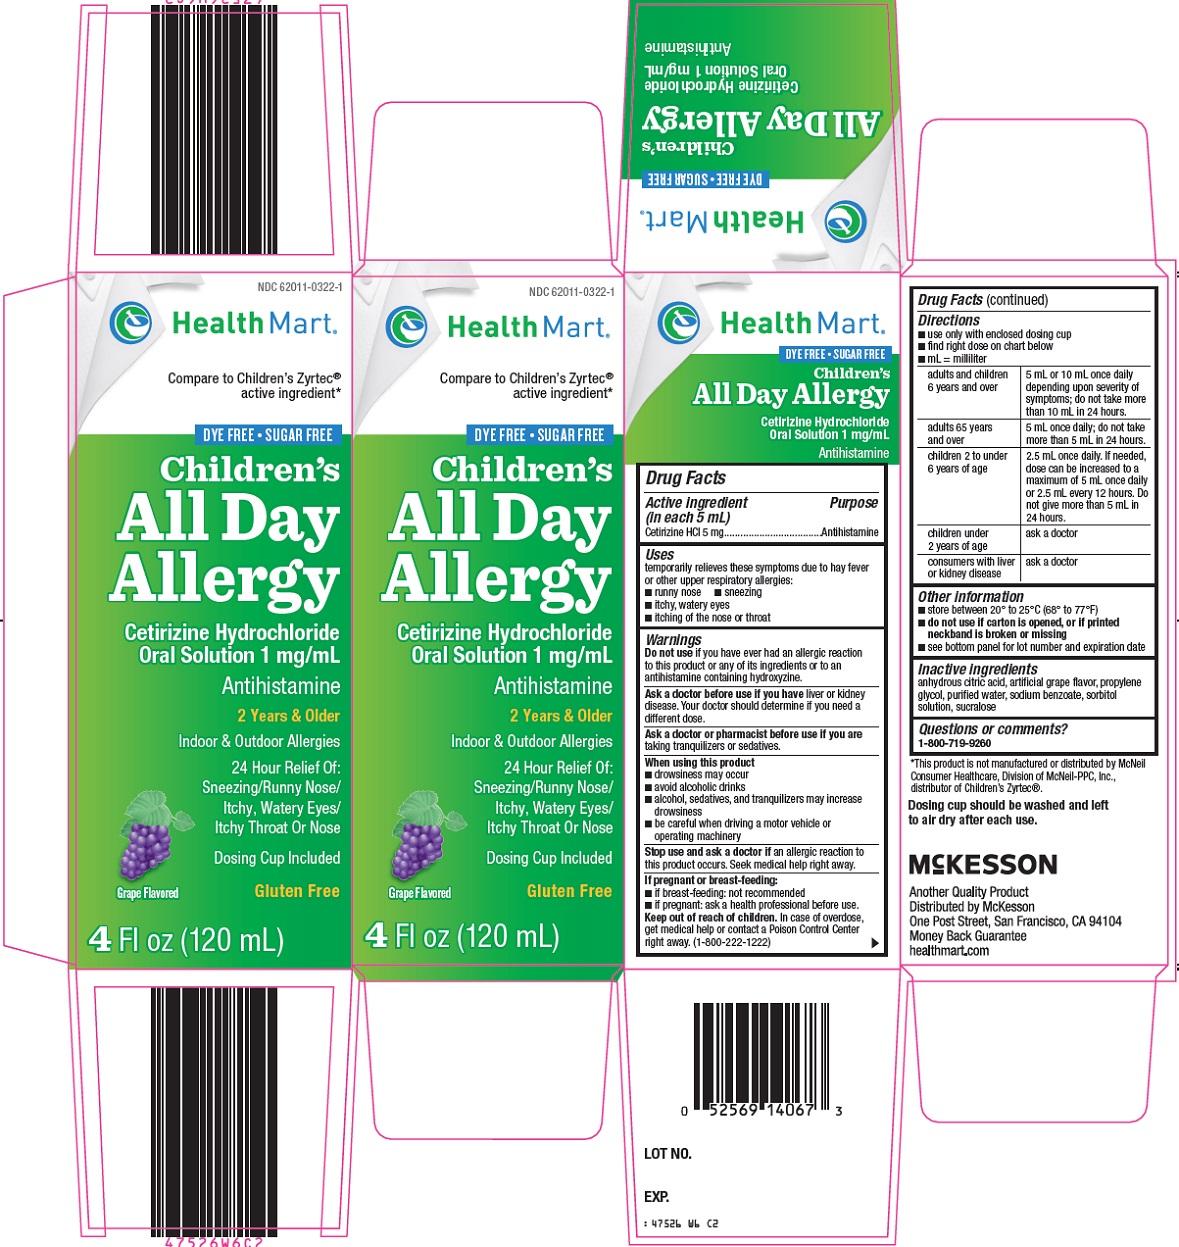 childrens-all-day-allergy